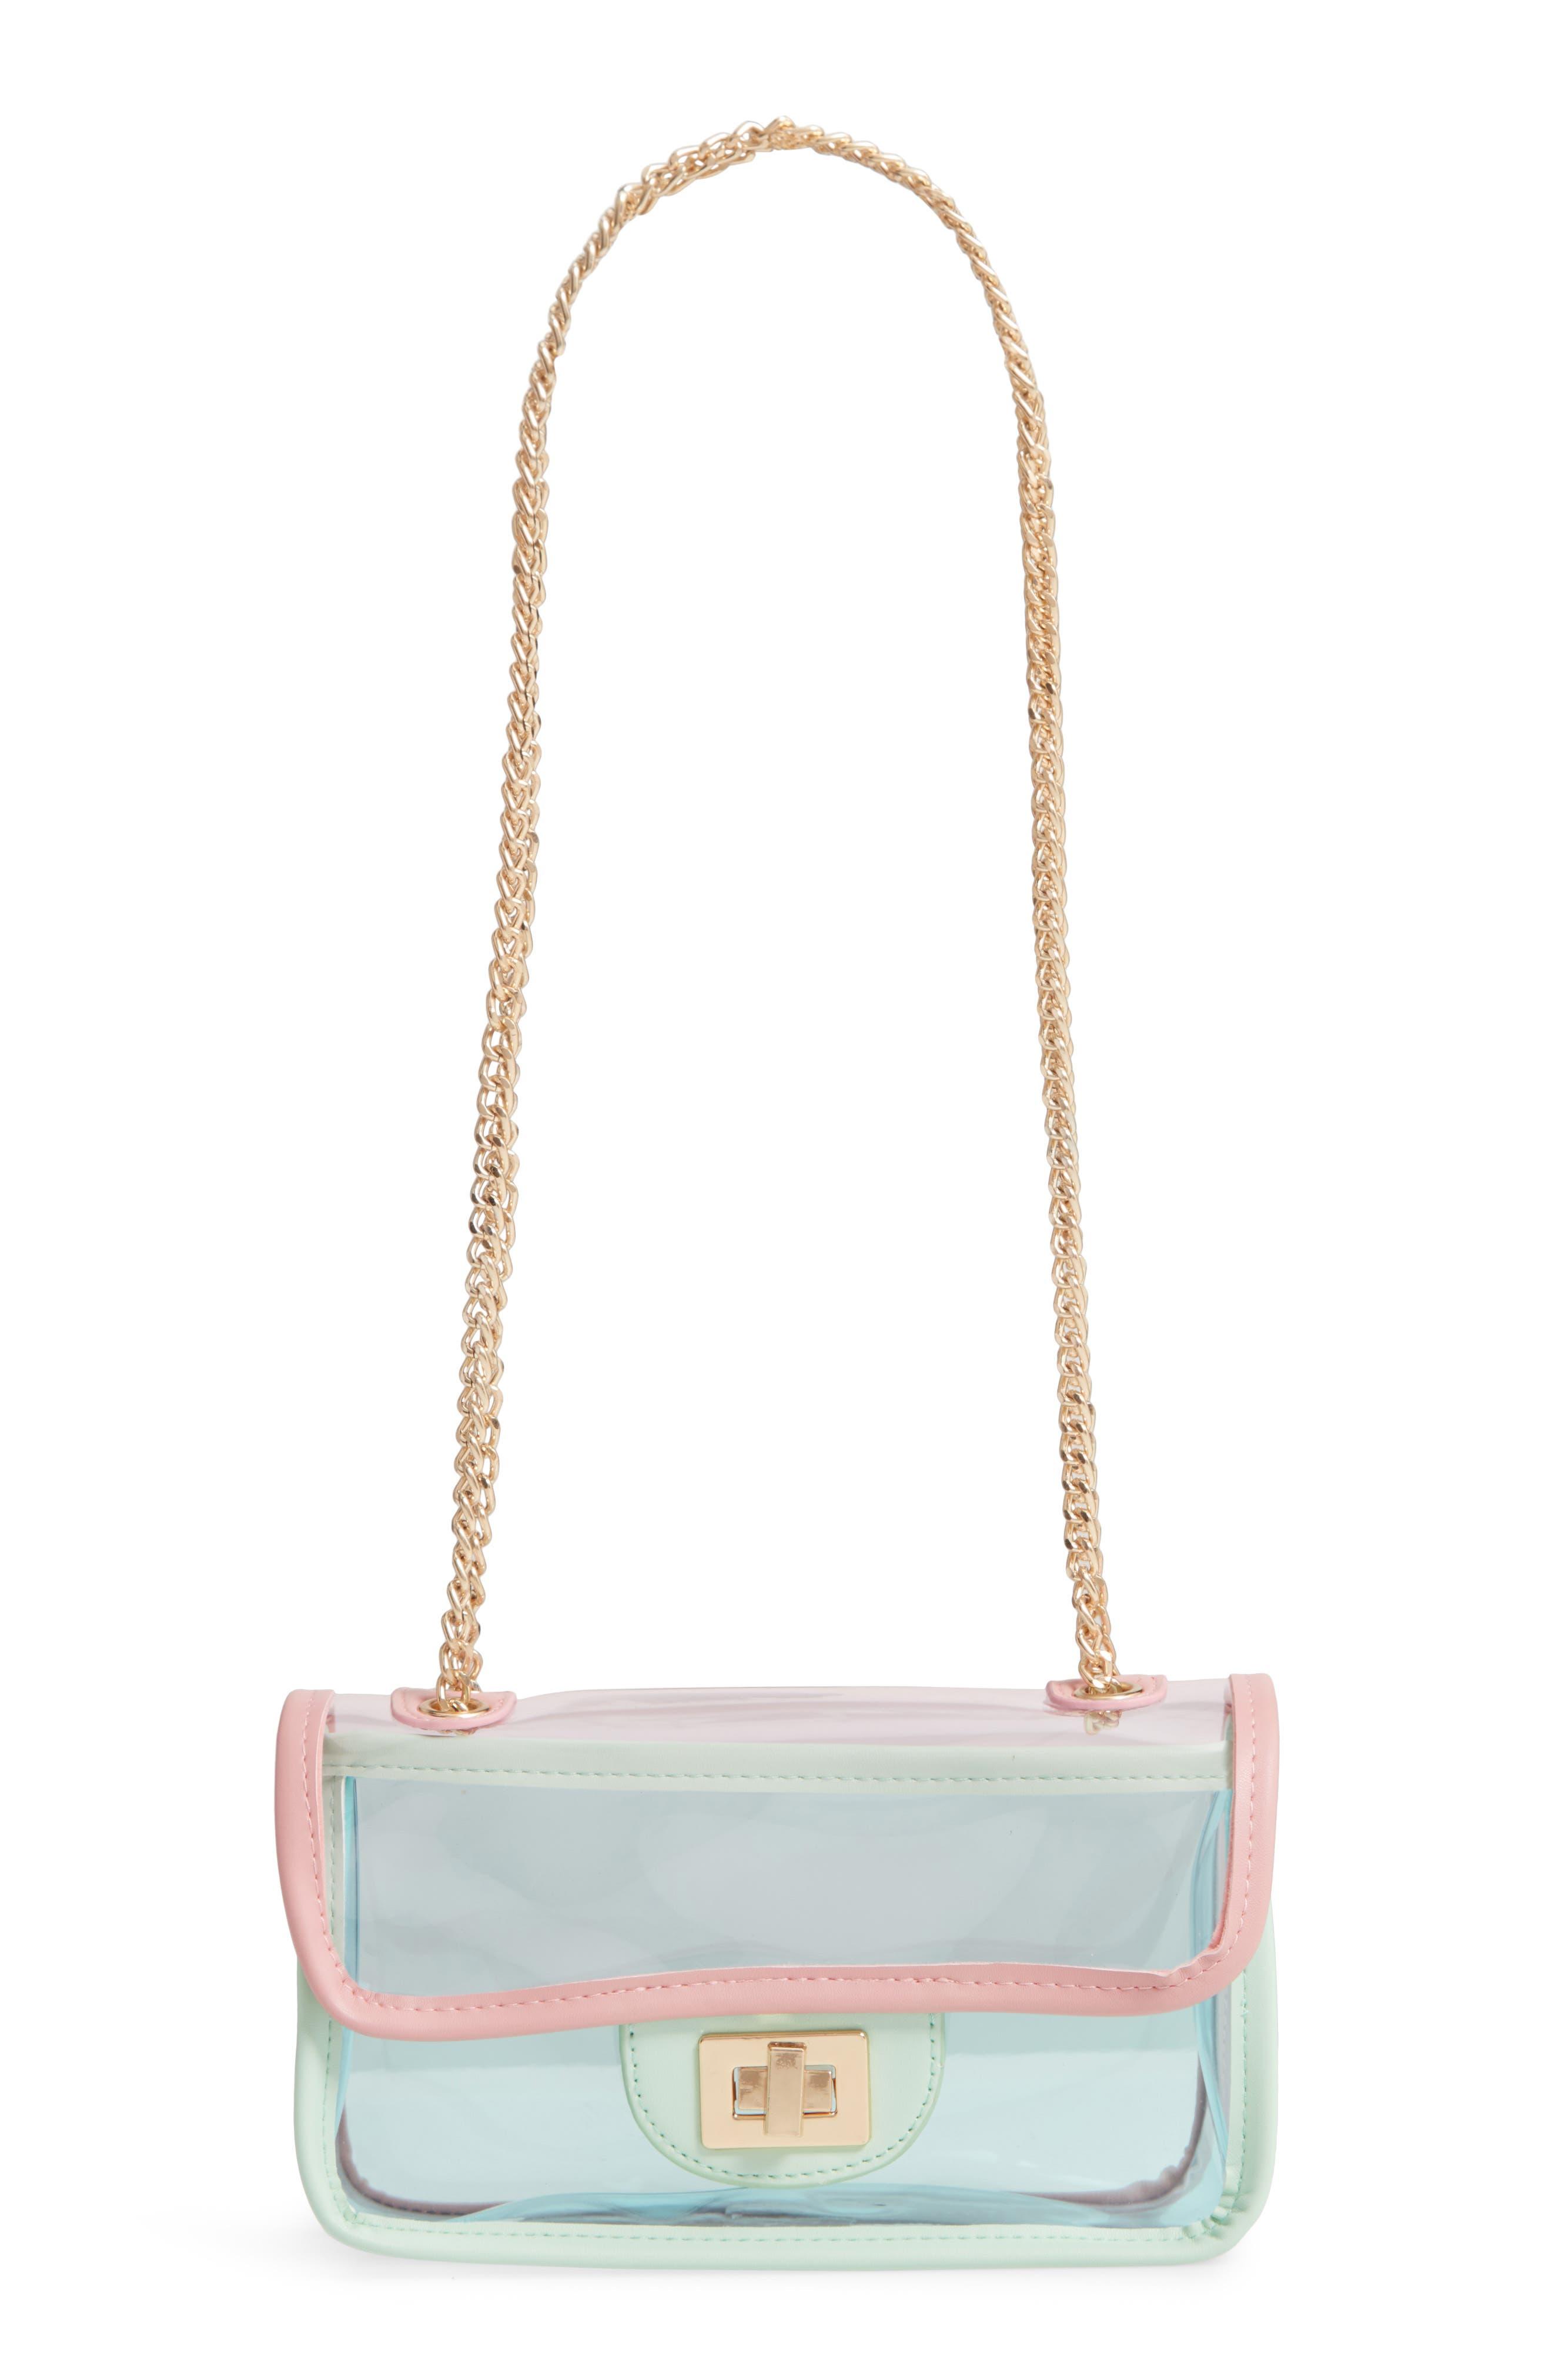 JANE & BERRY, Transparent Crossbody Bag, Main thumbnail 1, color, PINK MULTI